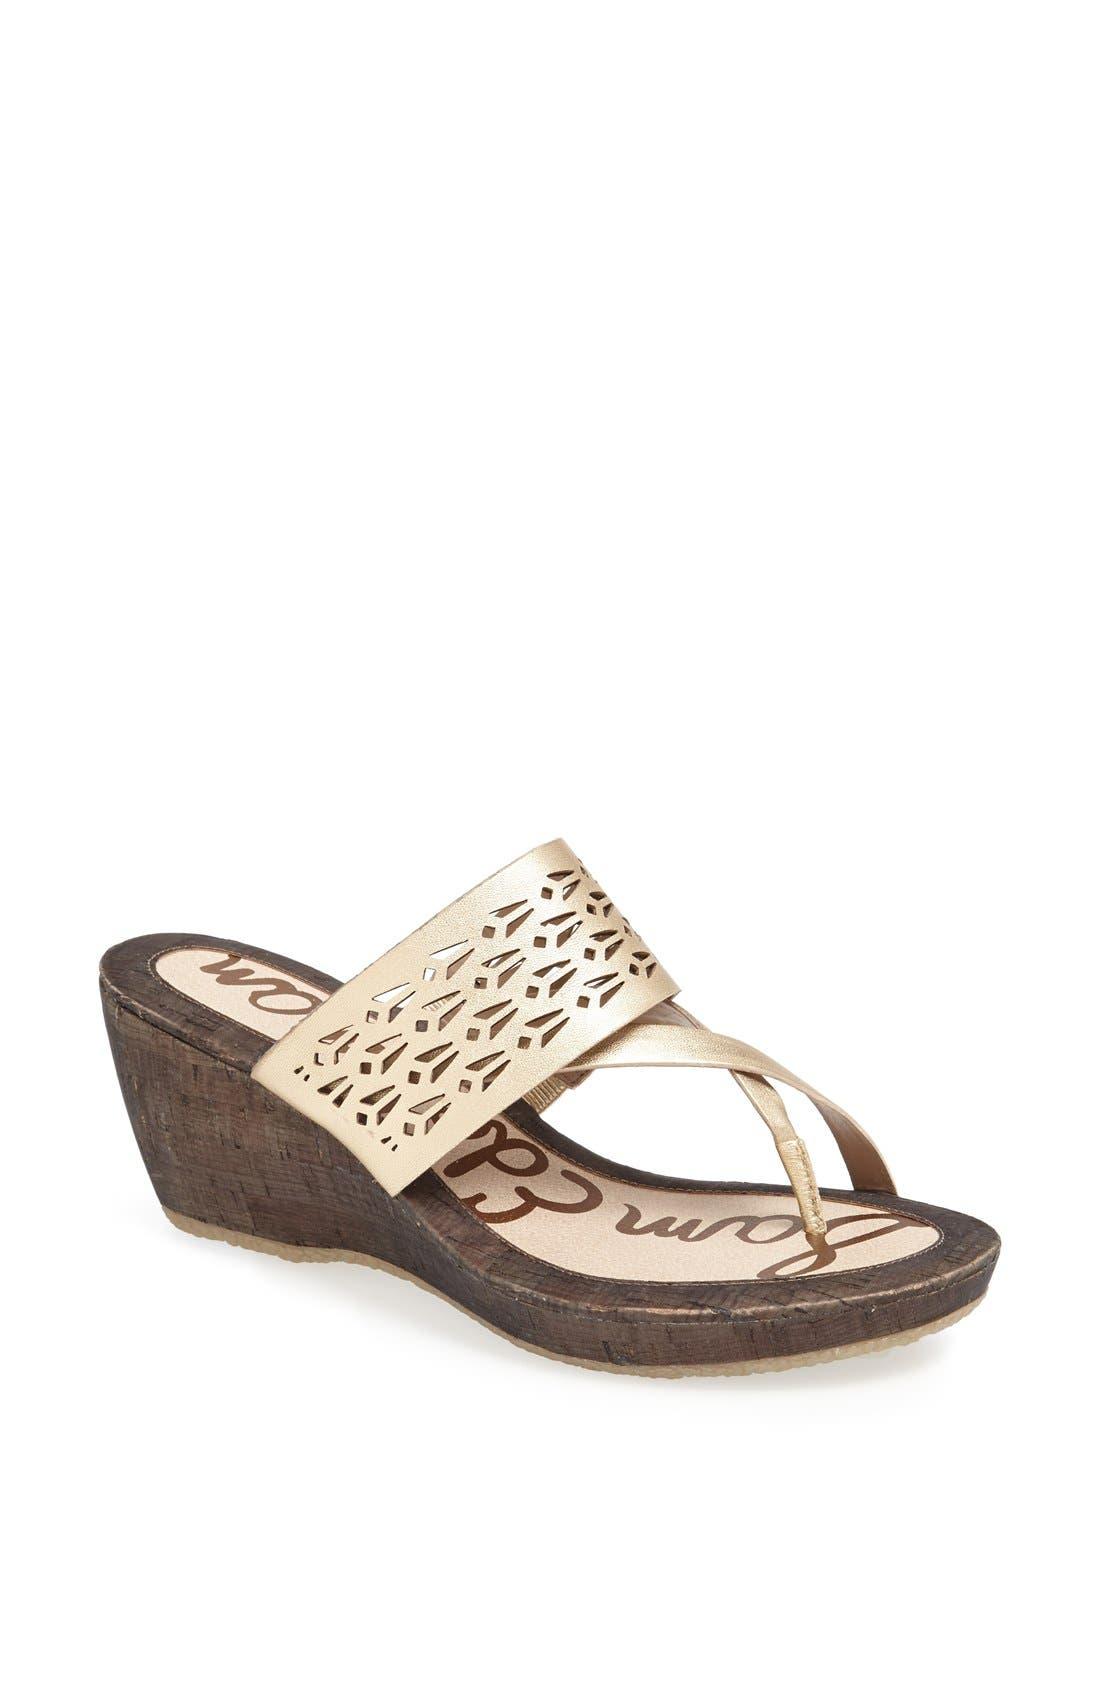 Alternate Image 1 Selected - Sam Edelman 'Nylee' Wedge Sandal